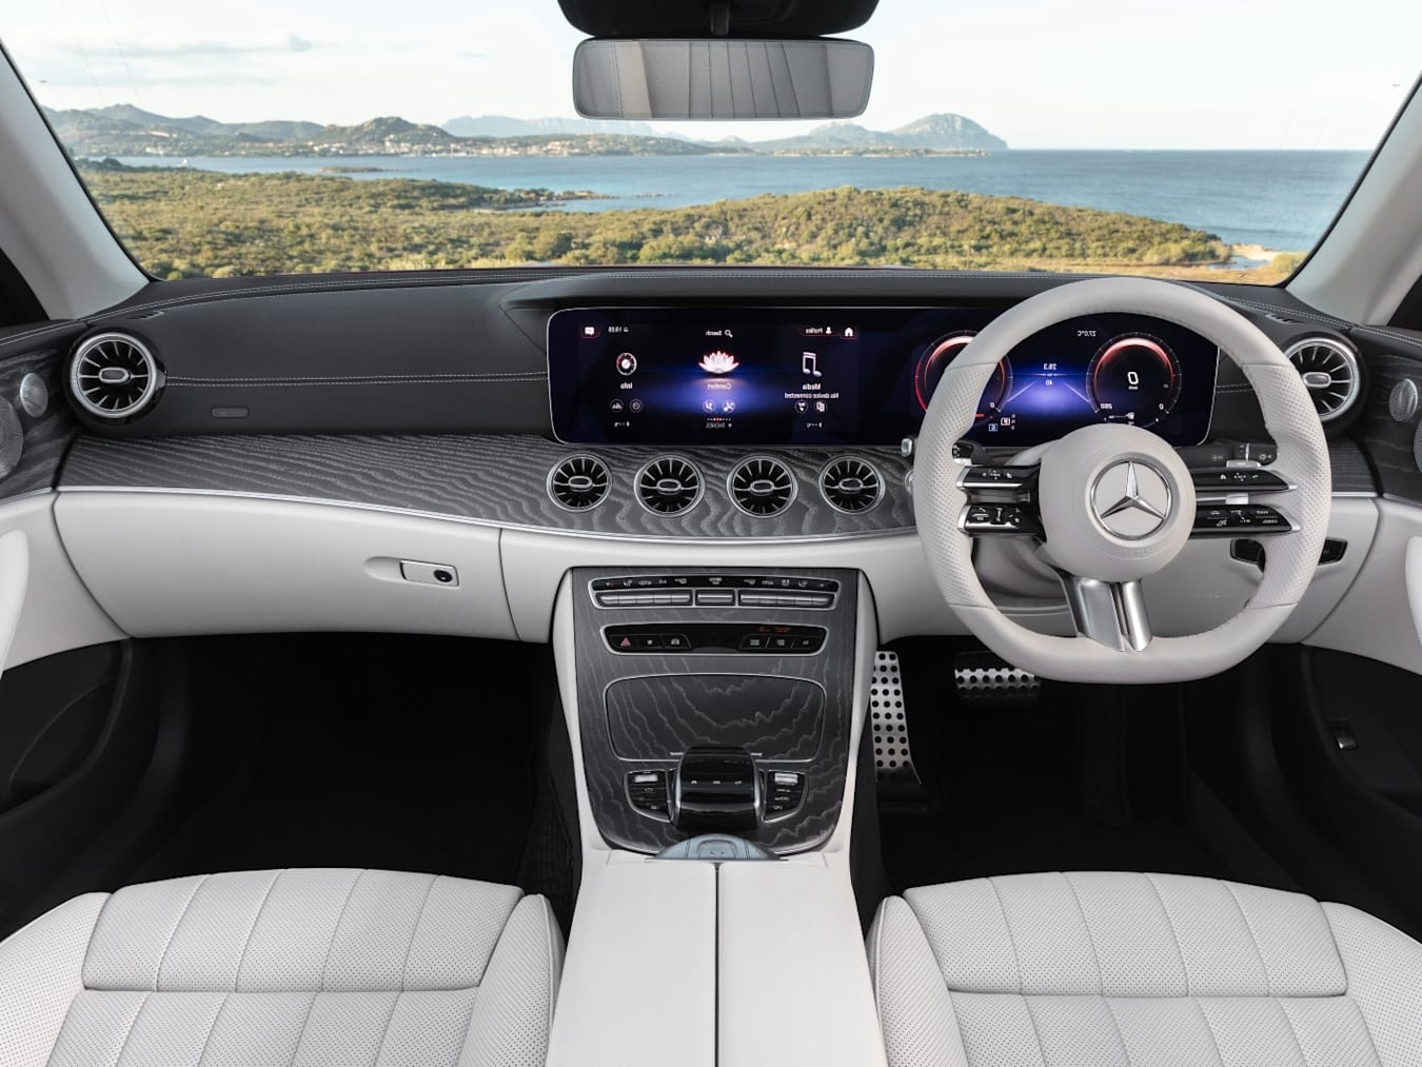 2021 Mercedes-Benz E300 Cabriolet